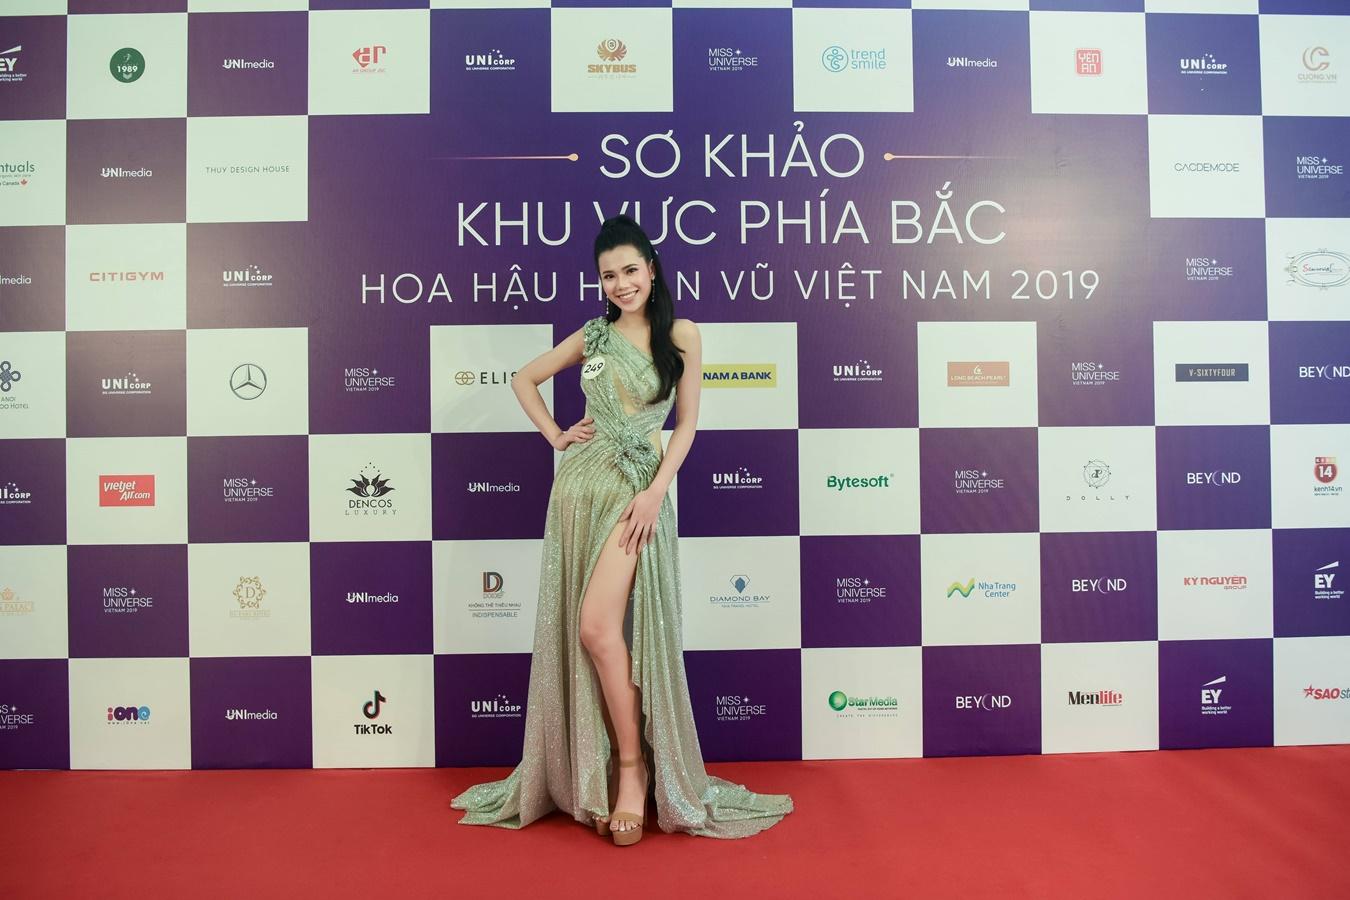 Thi sinh Hoa hau Hoan vu Viet Nam 2019 chup hinh o Backdrop (86)